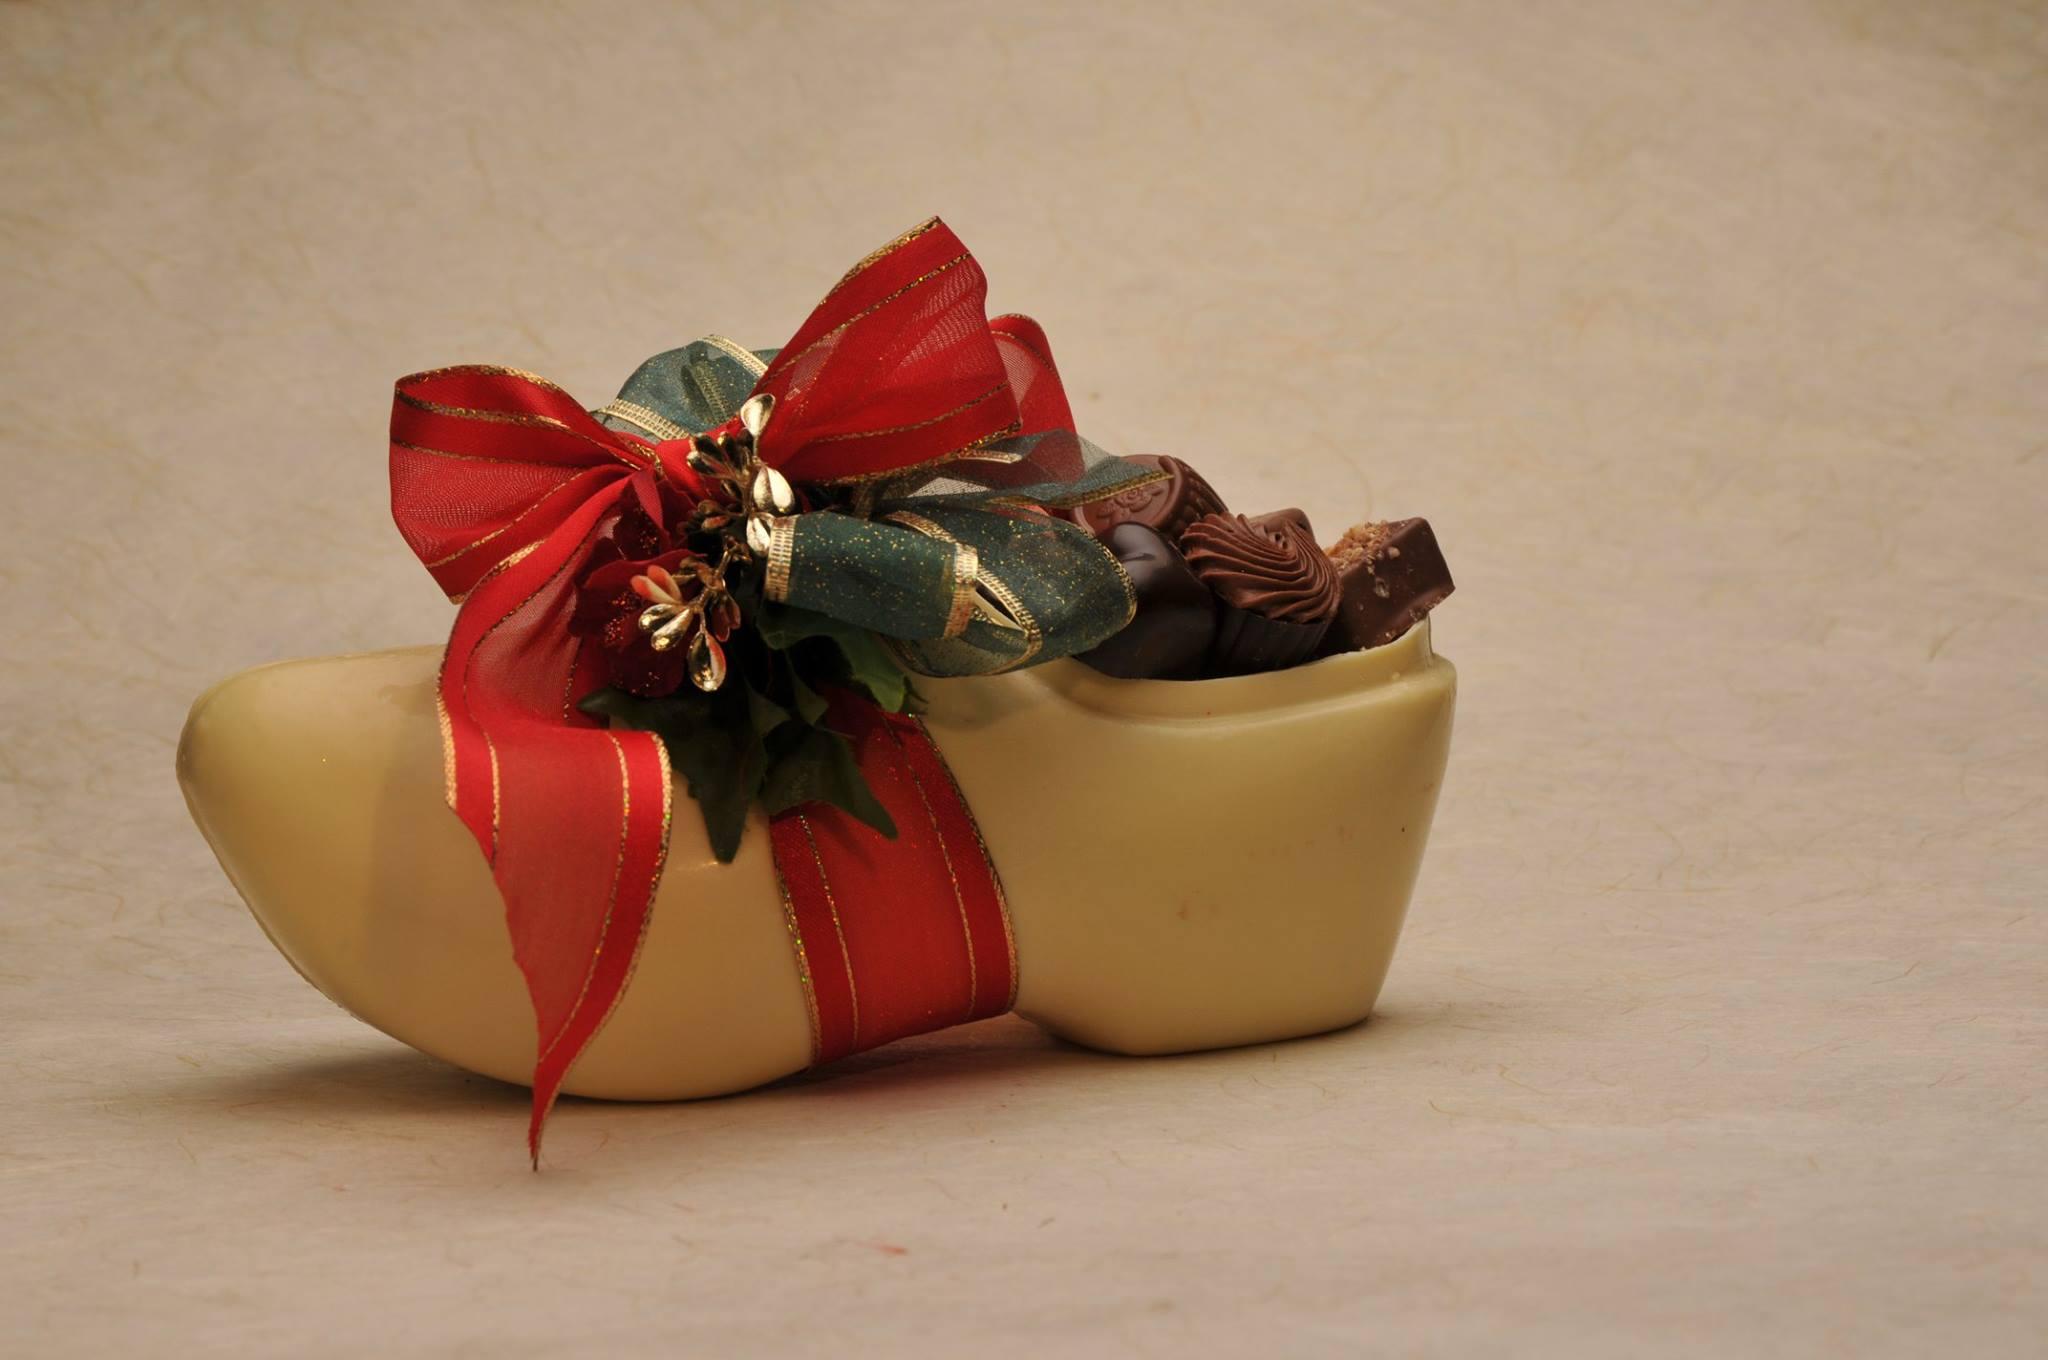 Chocolate Wooden Shoe